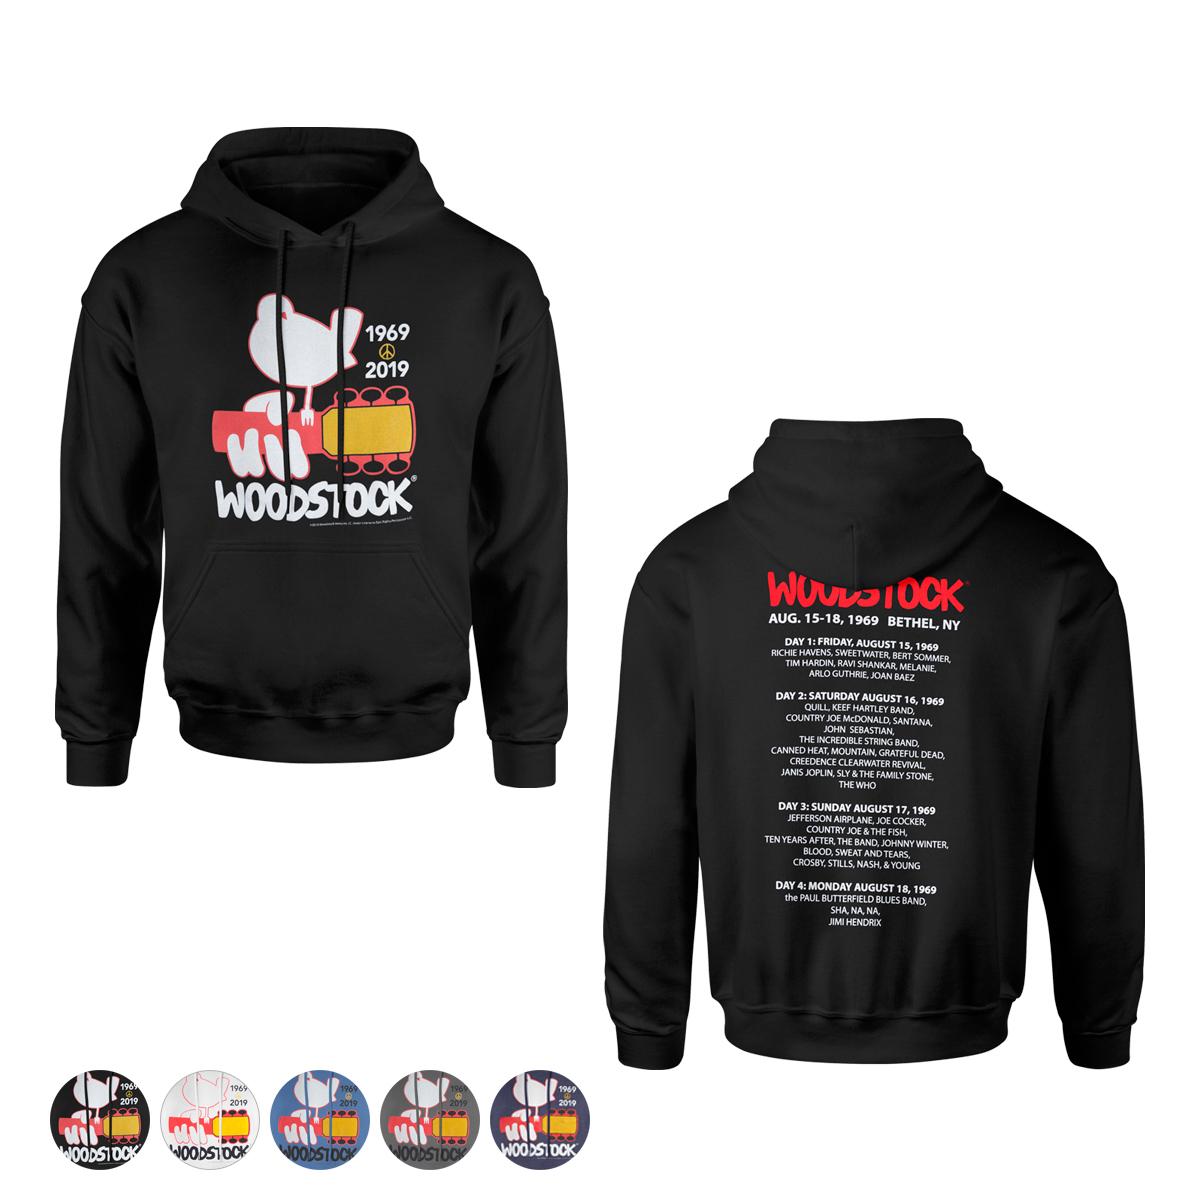 Woodstock 50th Anniversary Logo Hoodie Shop The